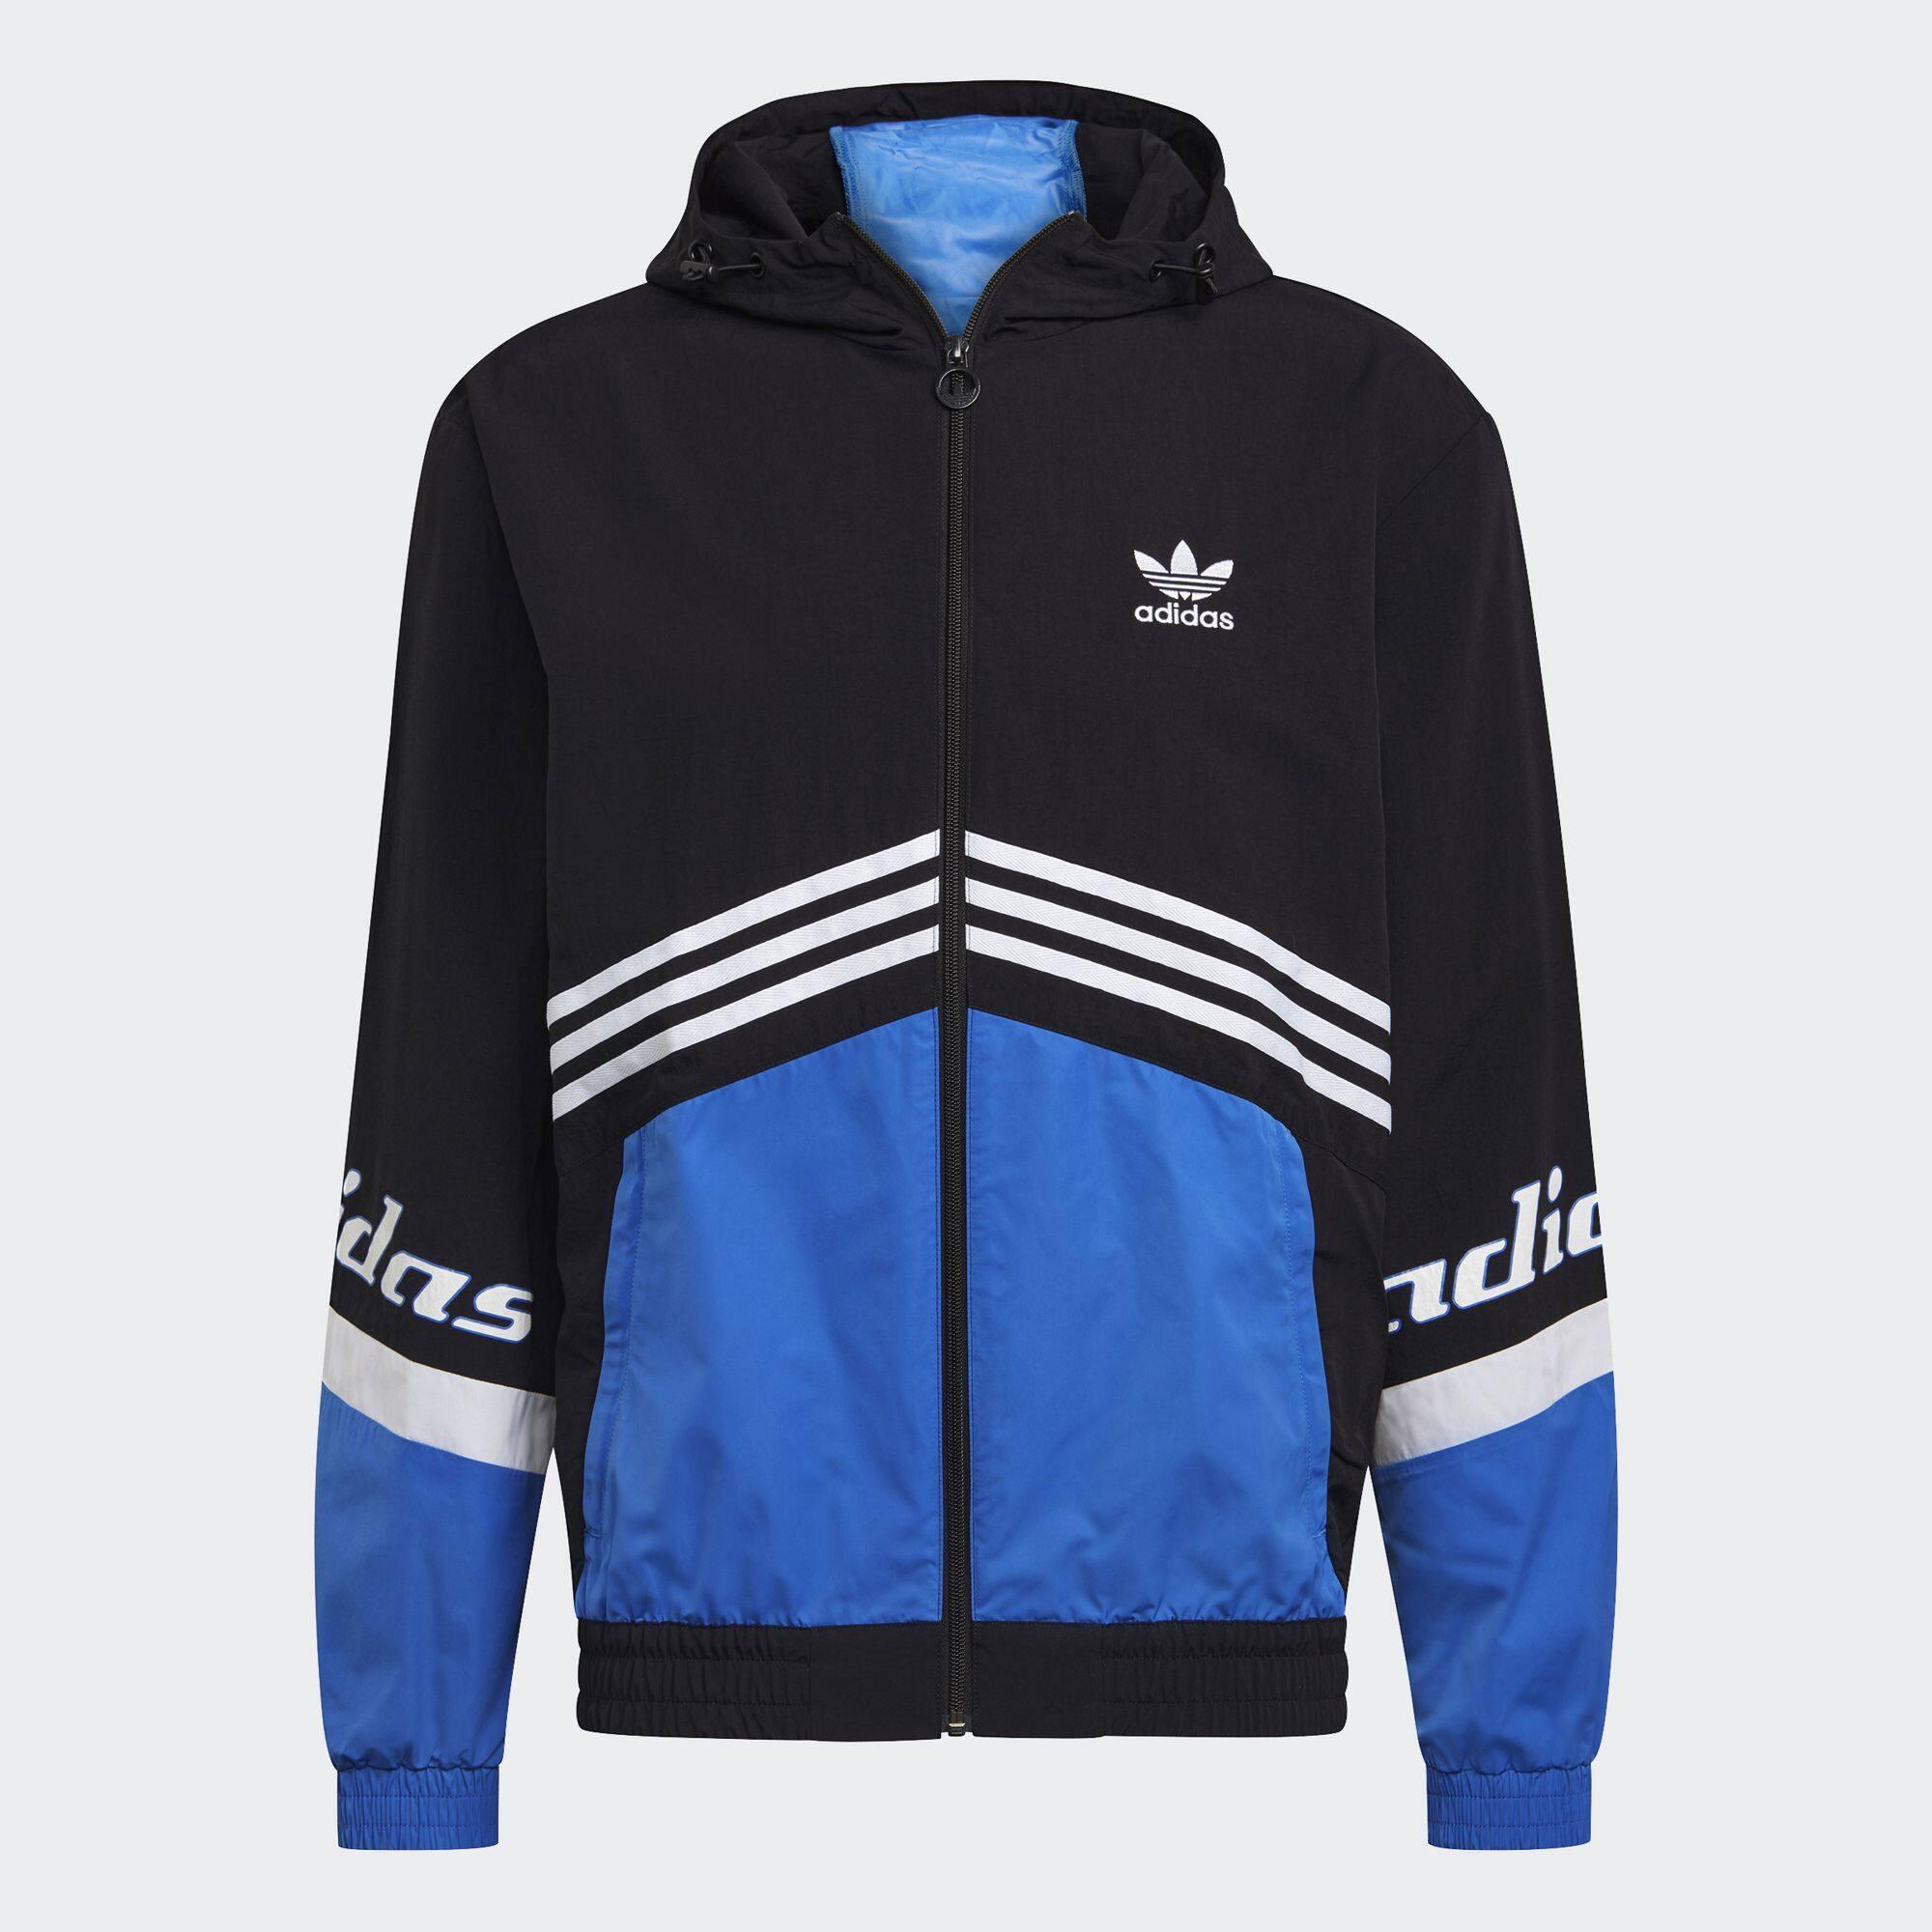 Adidas Originals Trefoil Graphic Pack Windbreaker ผู้ชาย สีดำ Ha4741.